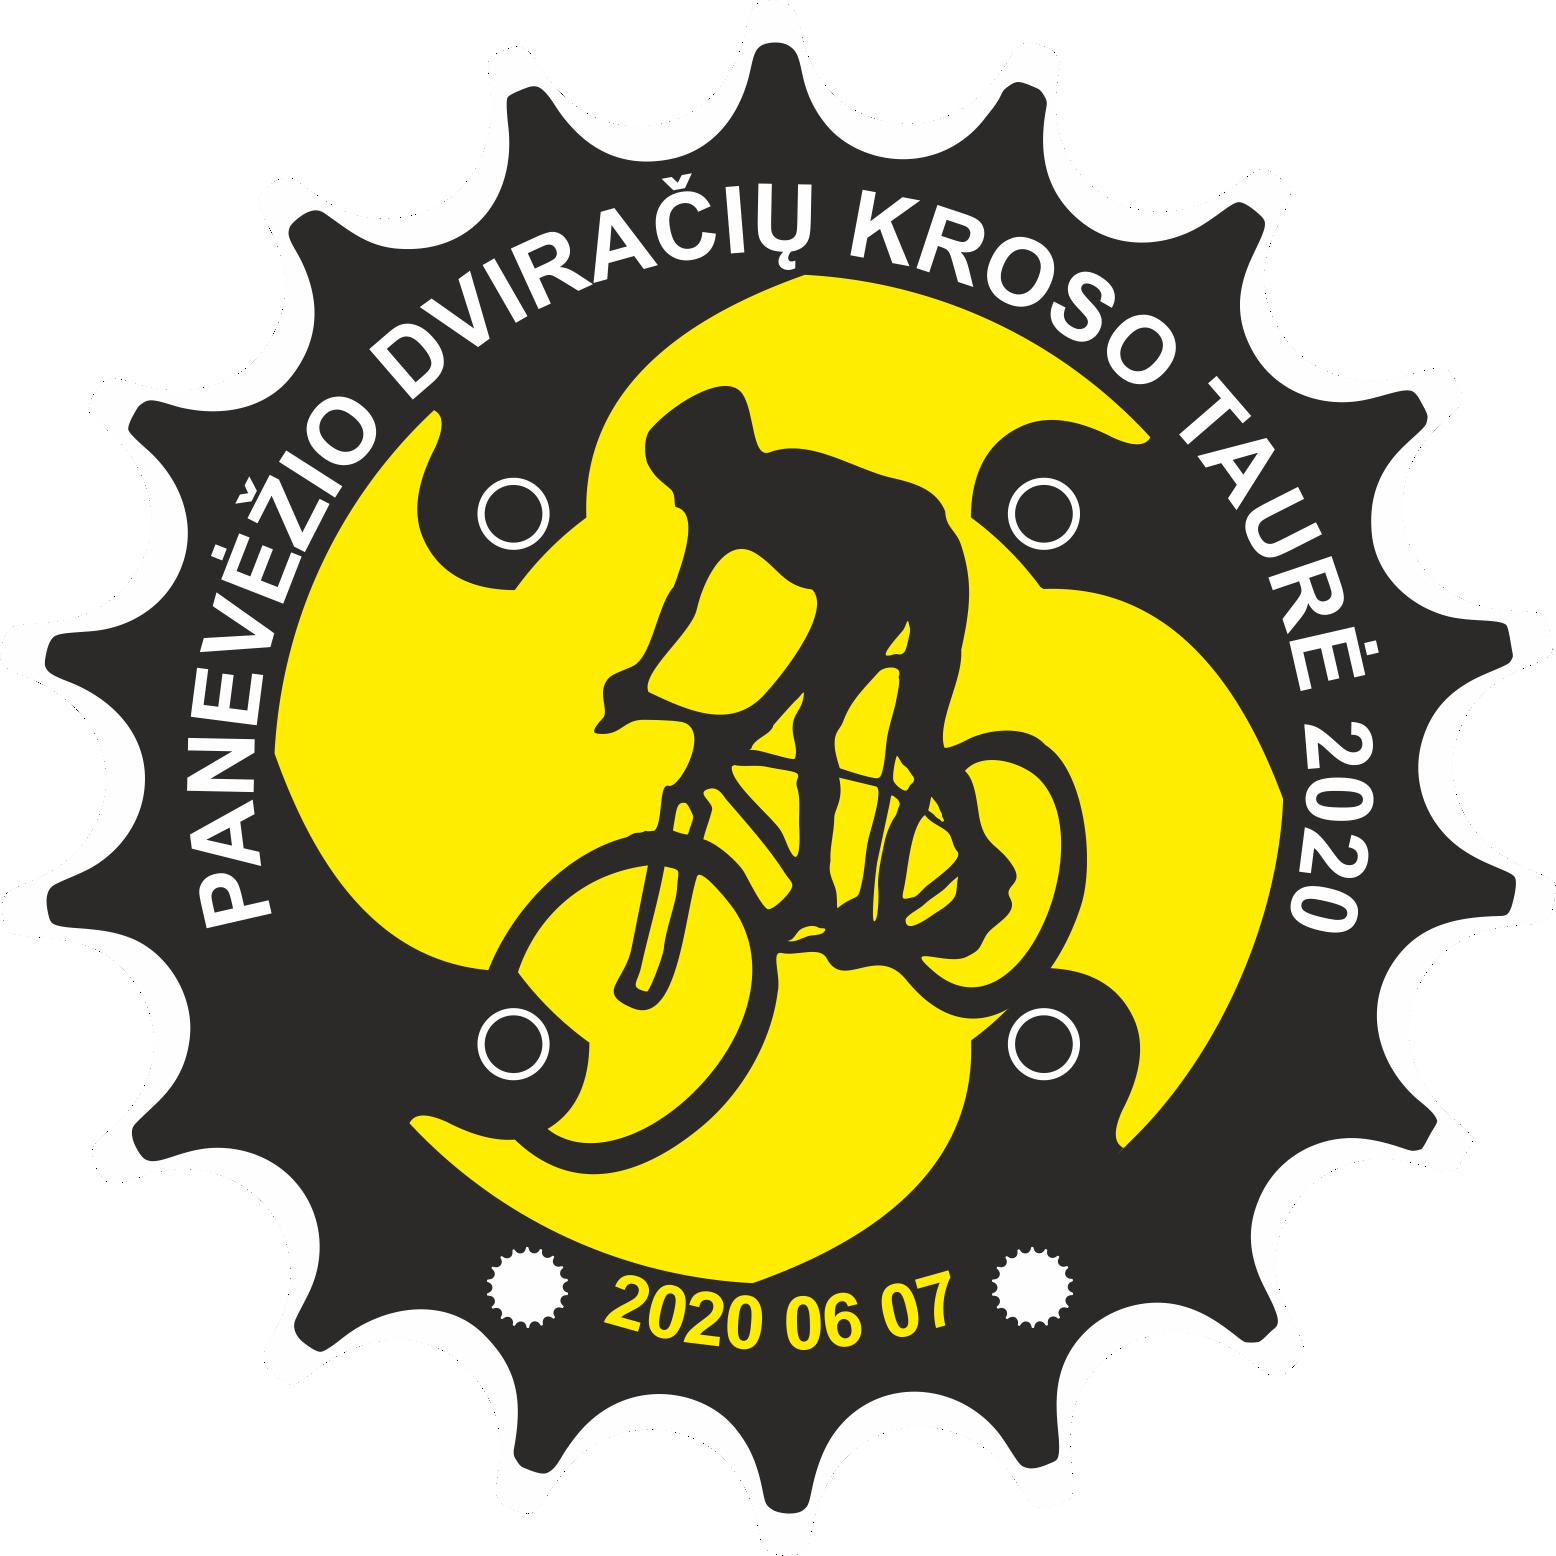 dviraciu kogo 2020